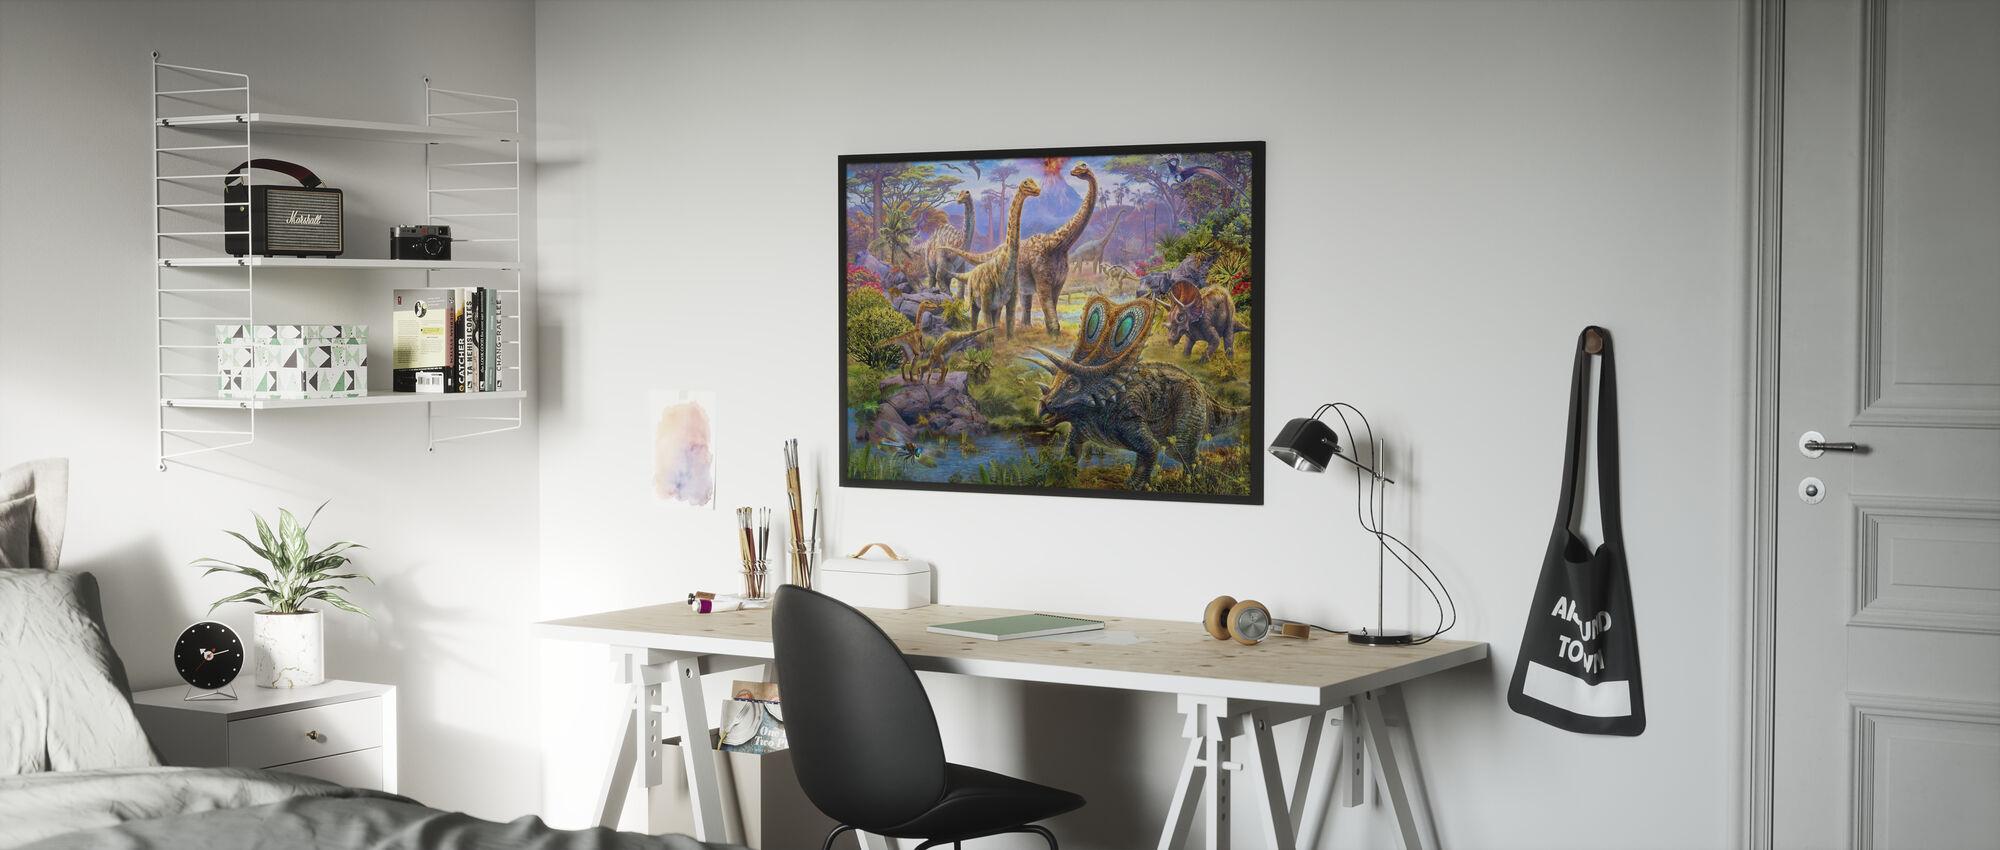 Sauropoden - Poster - Kinderzimmer